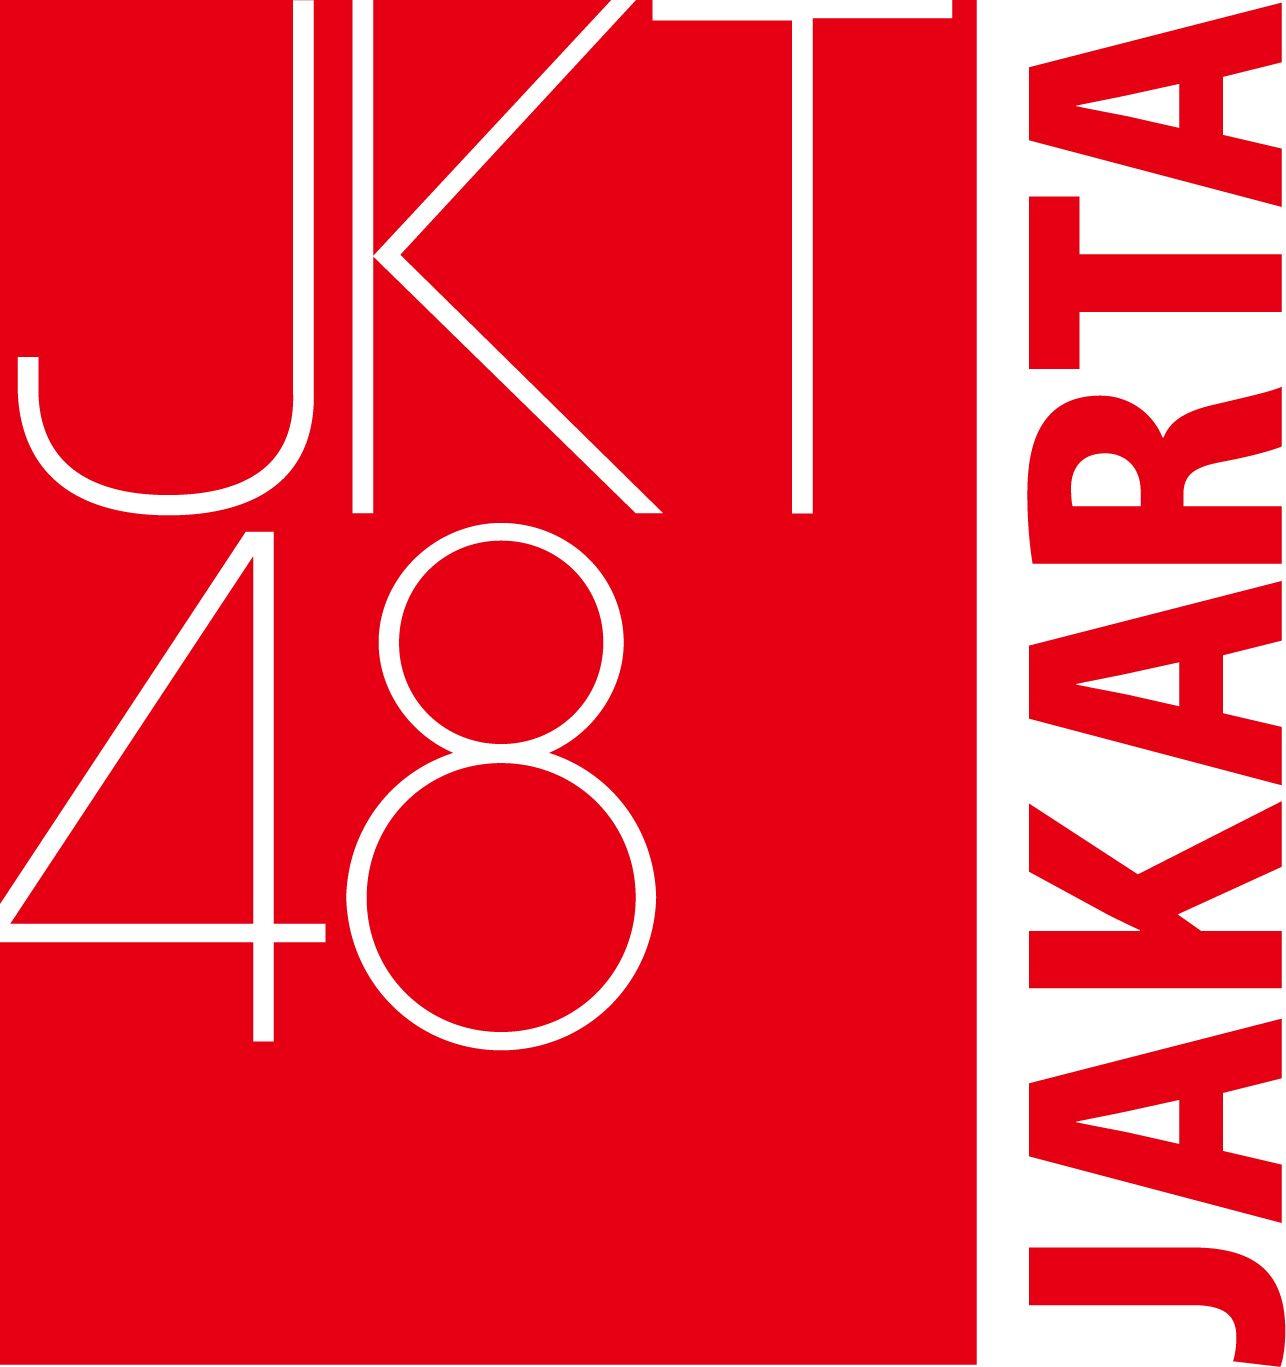 image logo jkt48